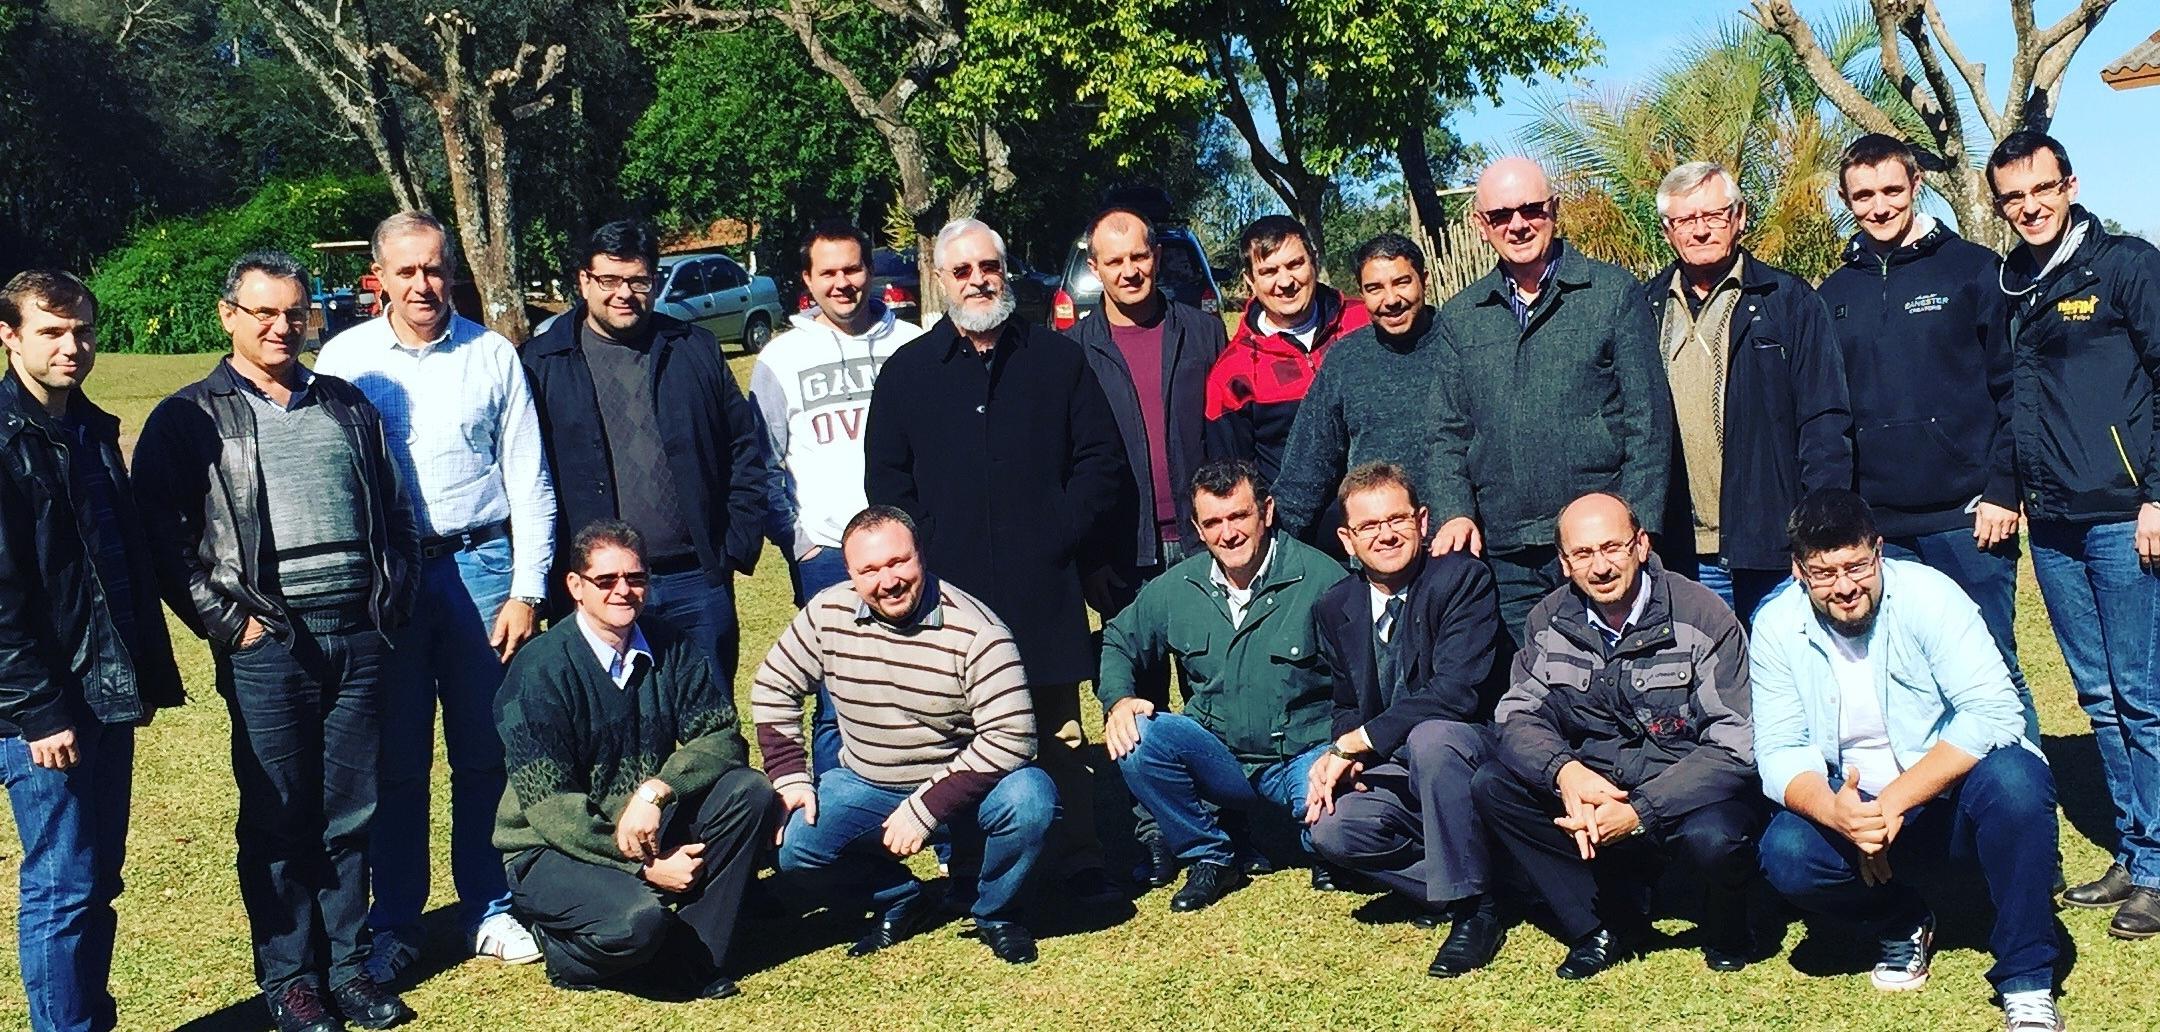 Rev. Dr. José Carlos Pezini and a SARA group